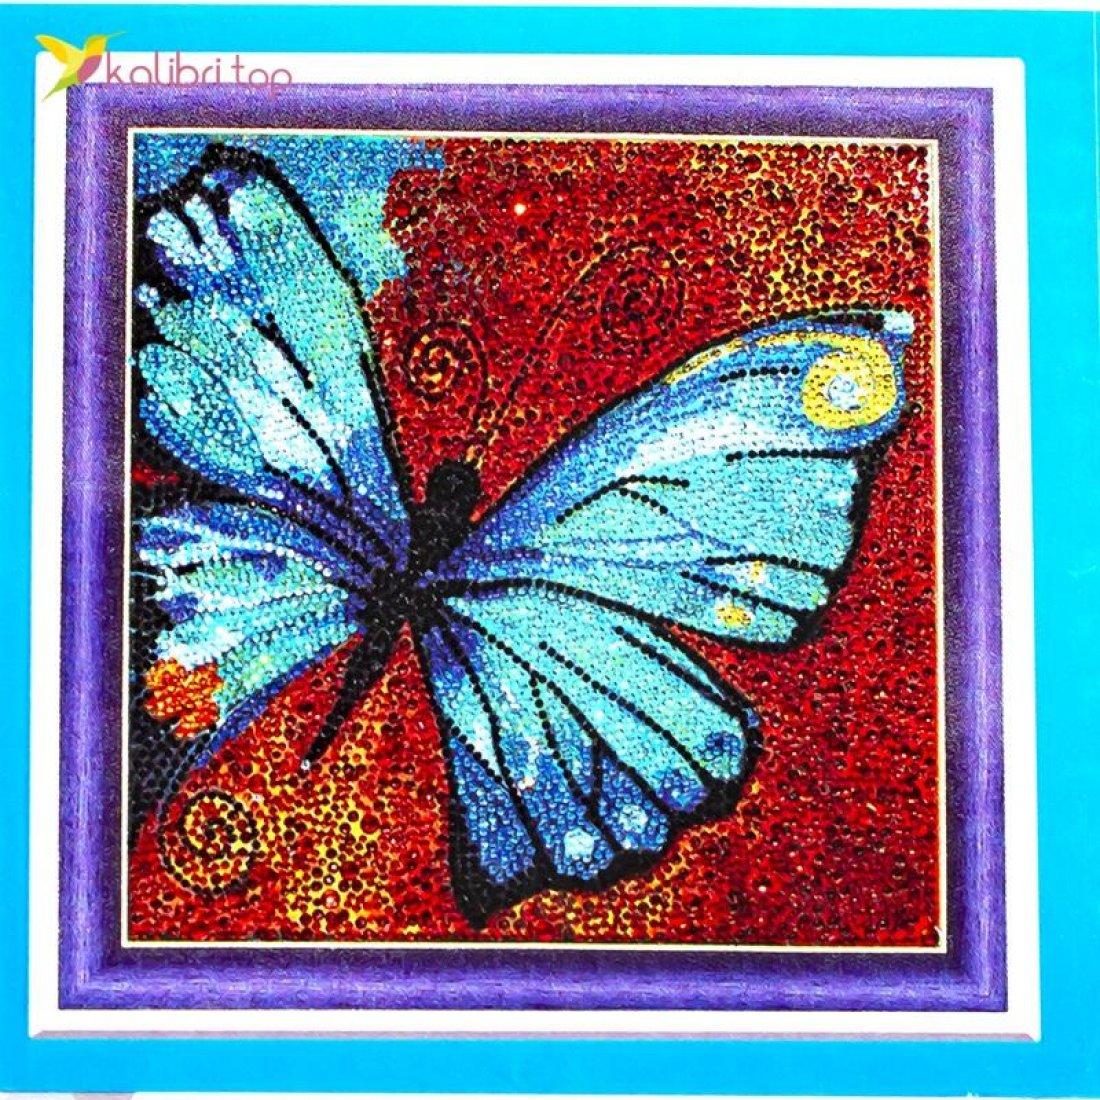 Алмазная мозаика по номерам Бабочка 30*30 см оптом фото 08